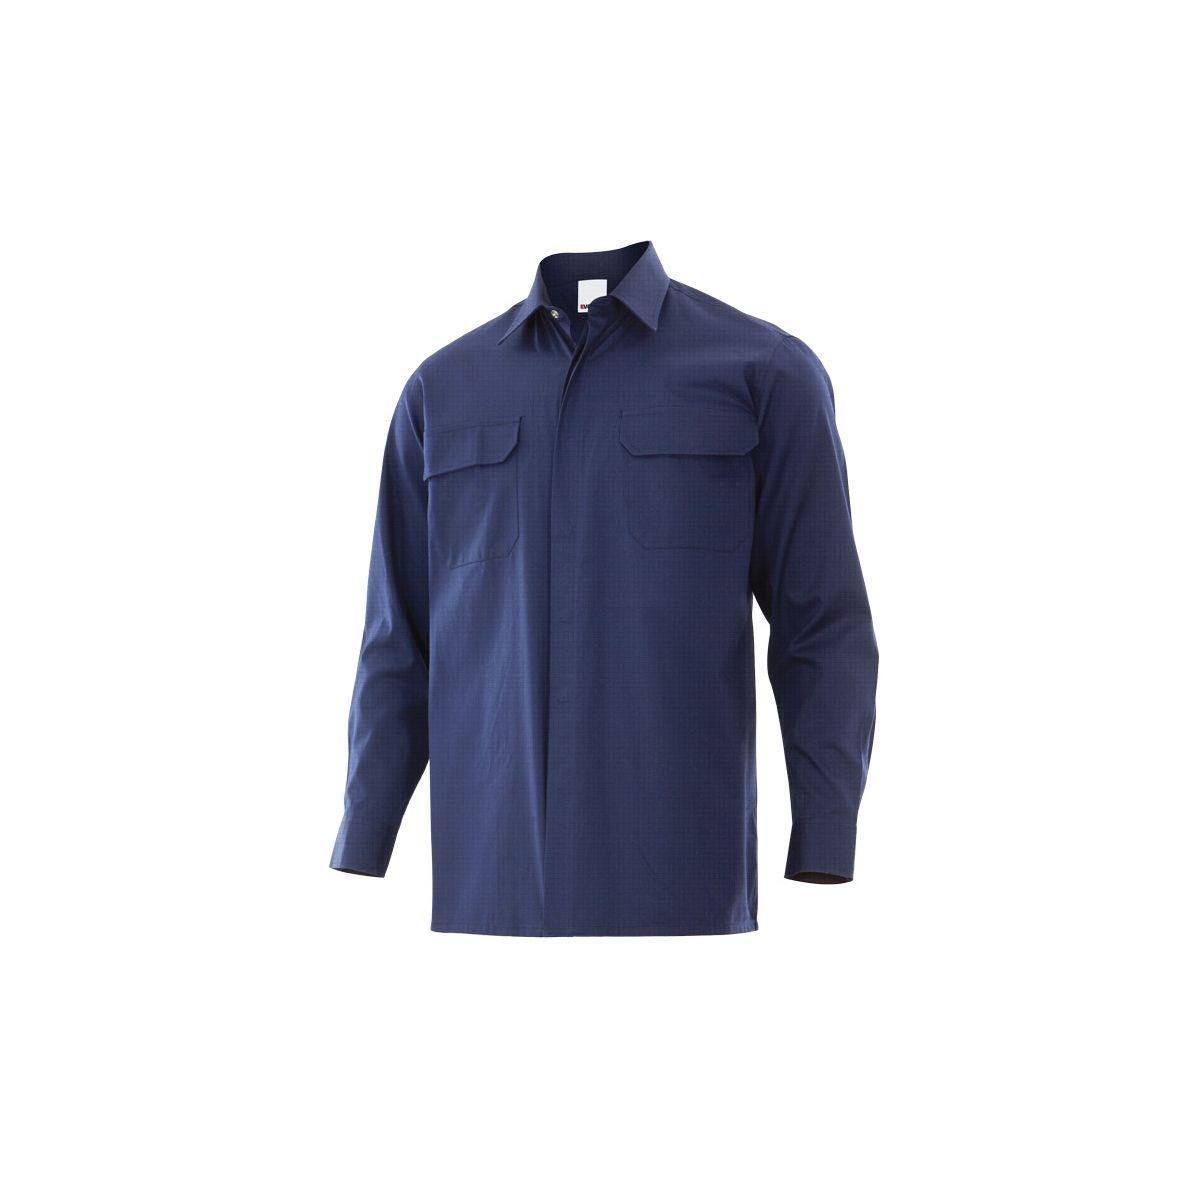 Camisa ignífuga - antiestática (ref: 605001)